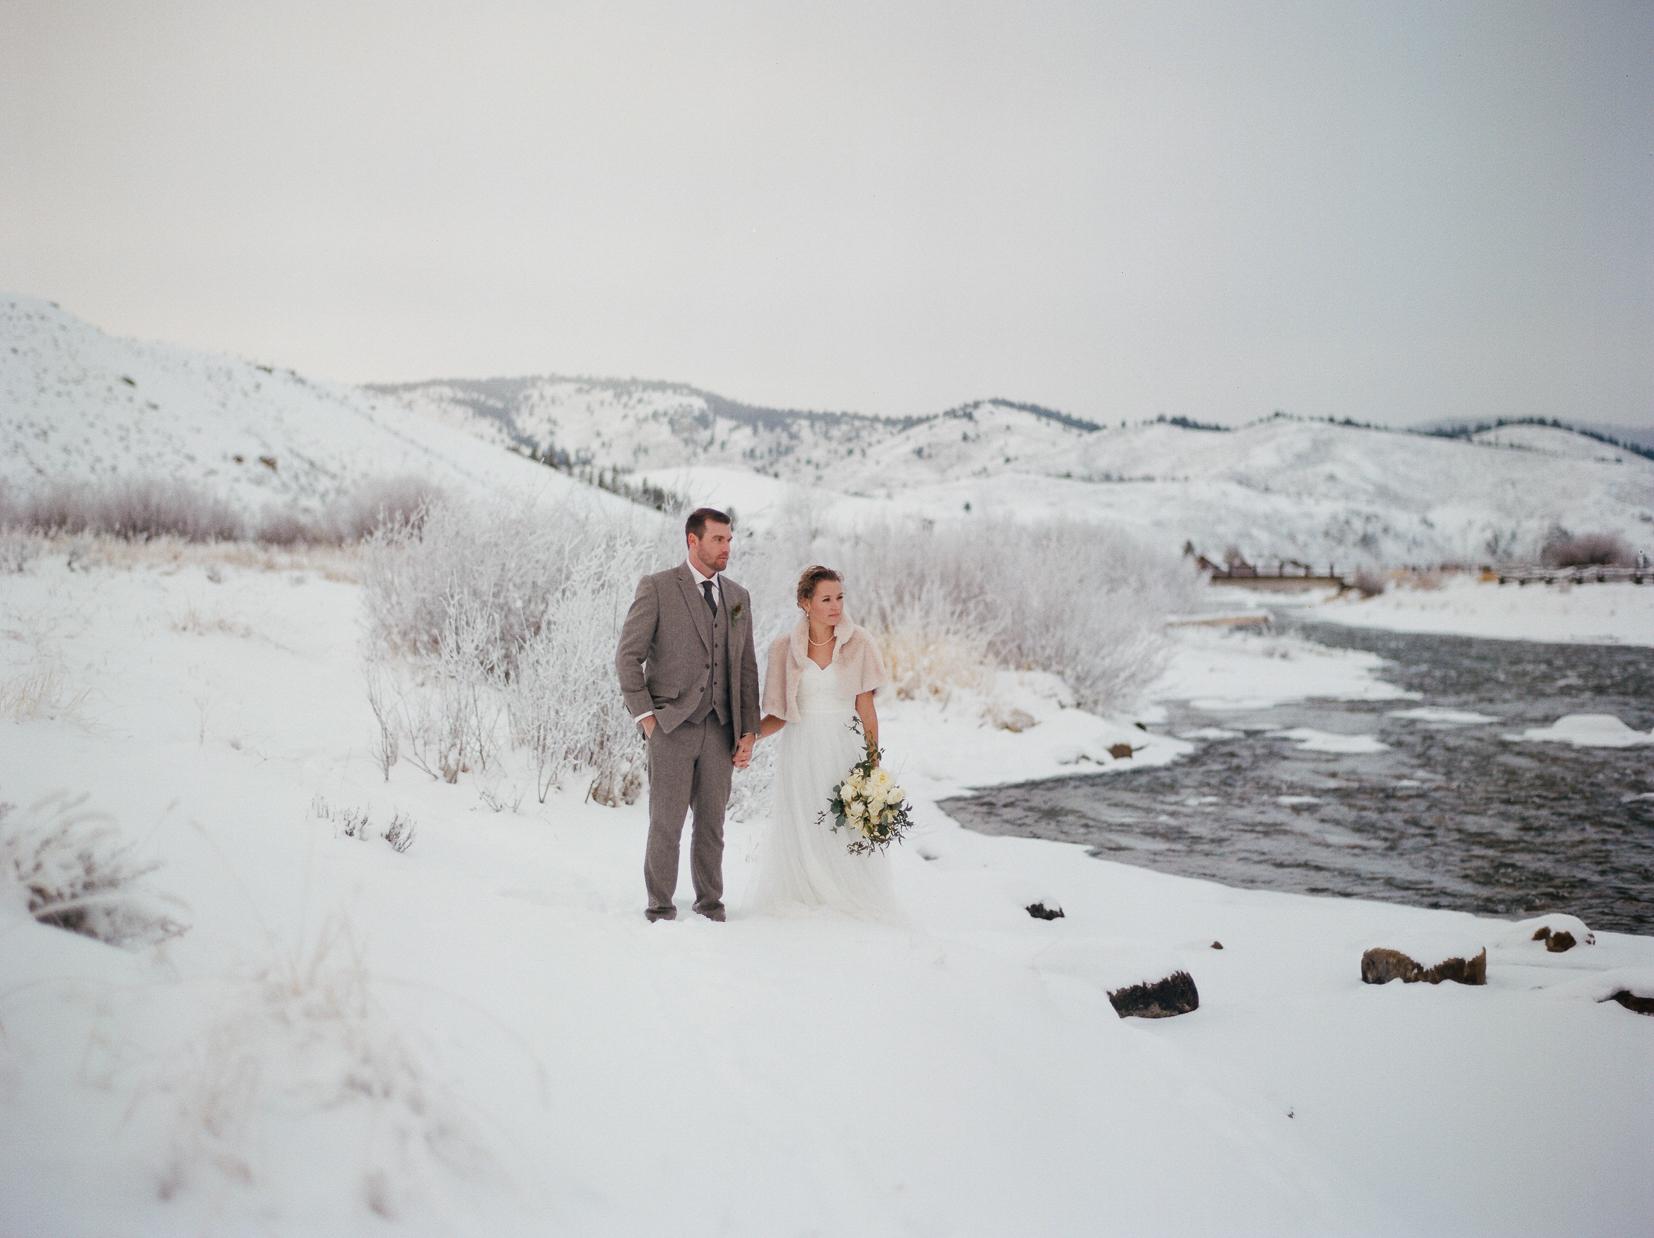 Sun Valley Wedding Photographer (23 of 29).jpg